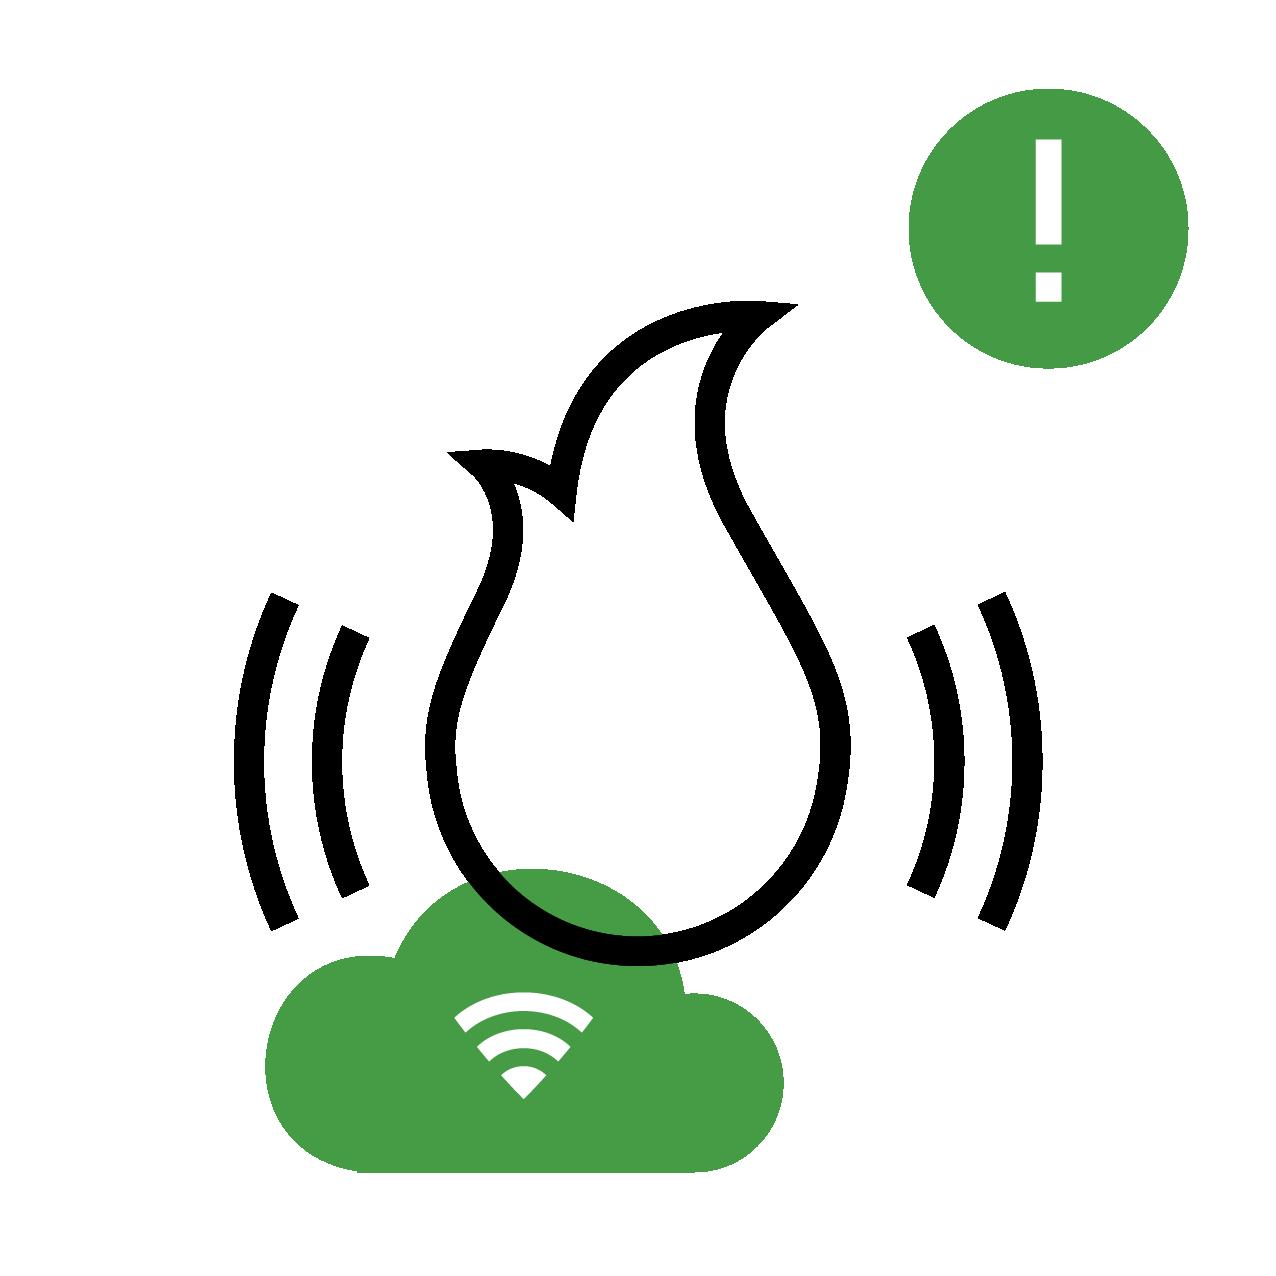 Fire alarm icon, smoke detectors, carbon monoxide detectors